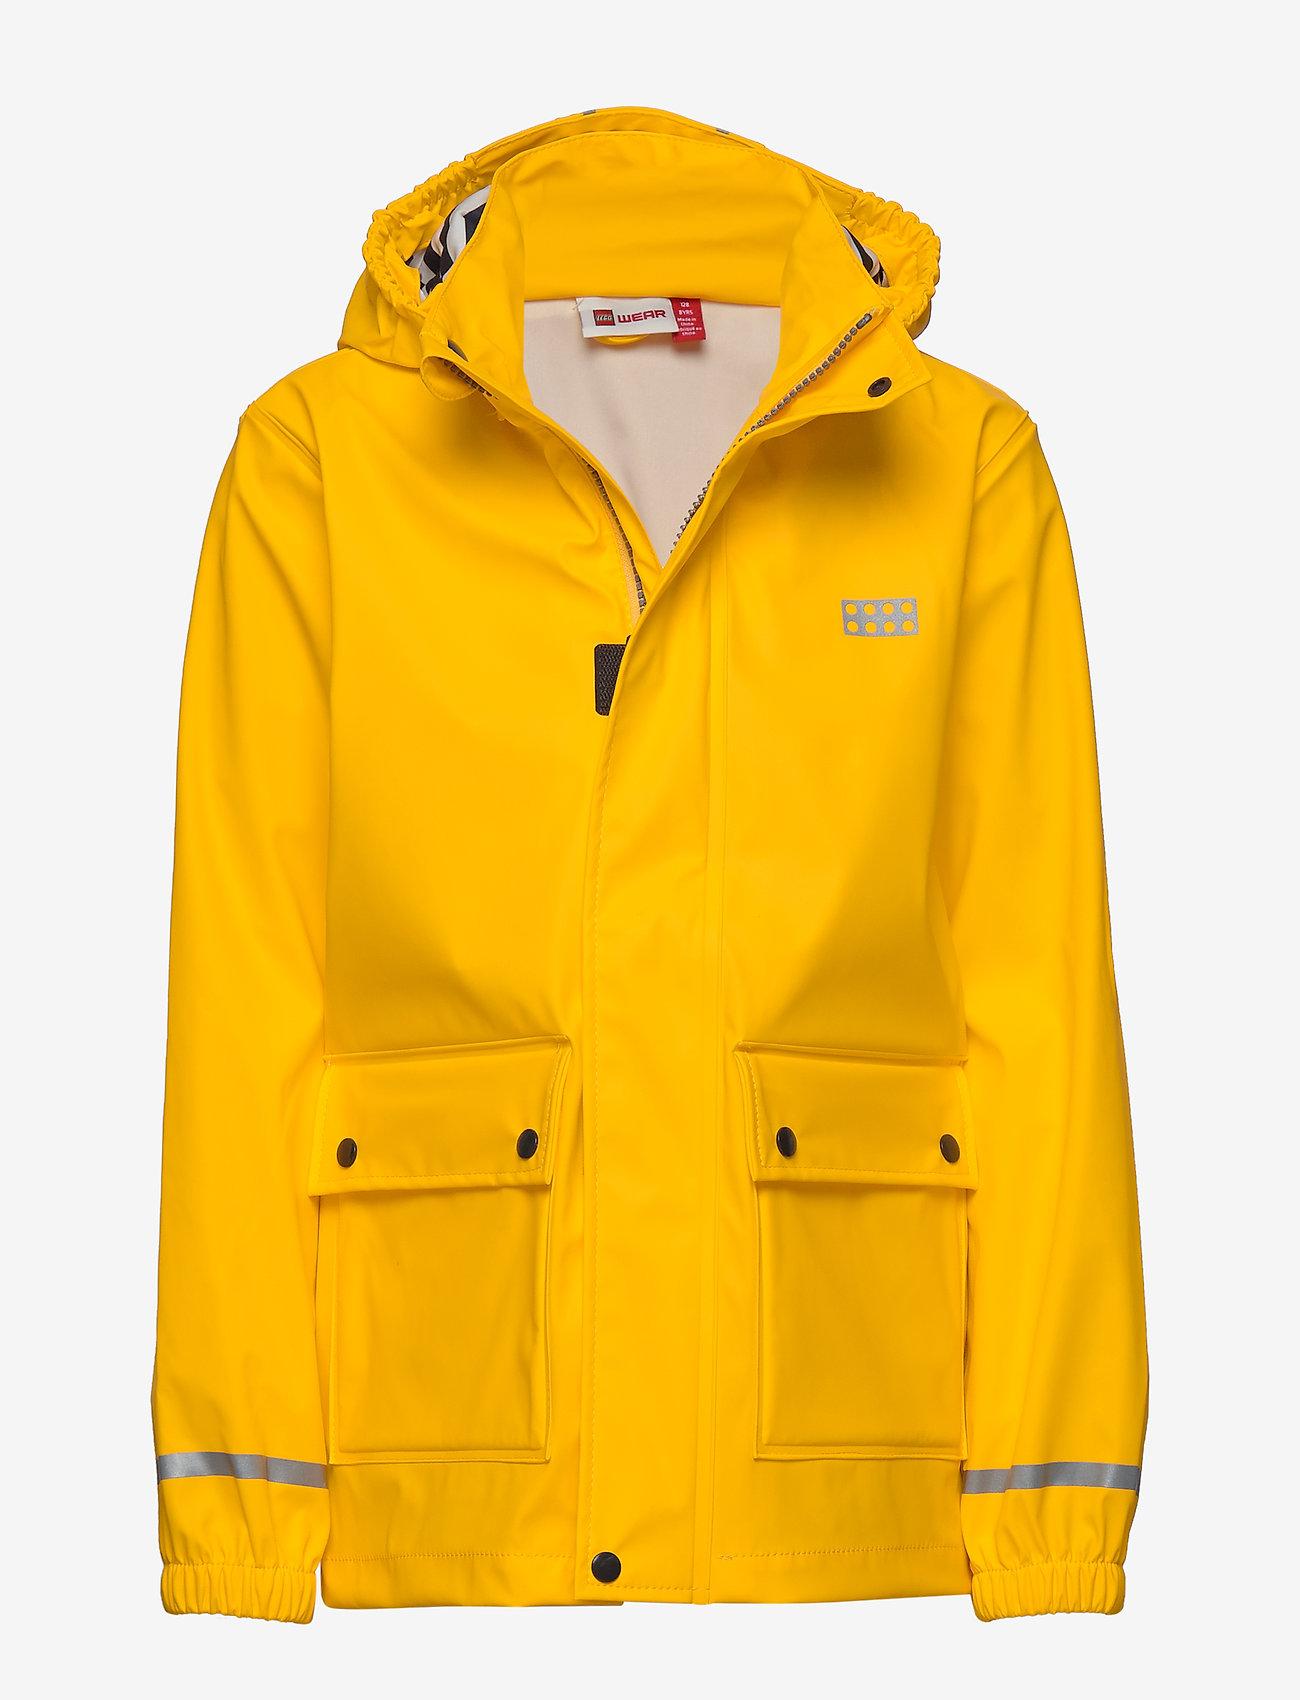 Lego wear - LWJOSHUA 212 - RAIN JACKET - vestes - dark yellow - 0